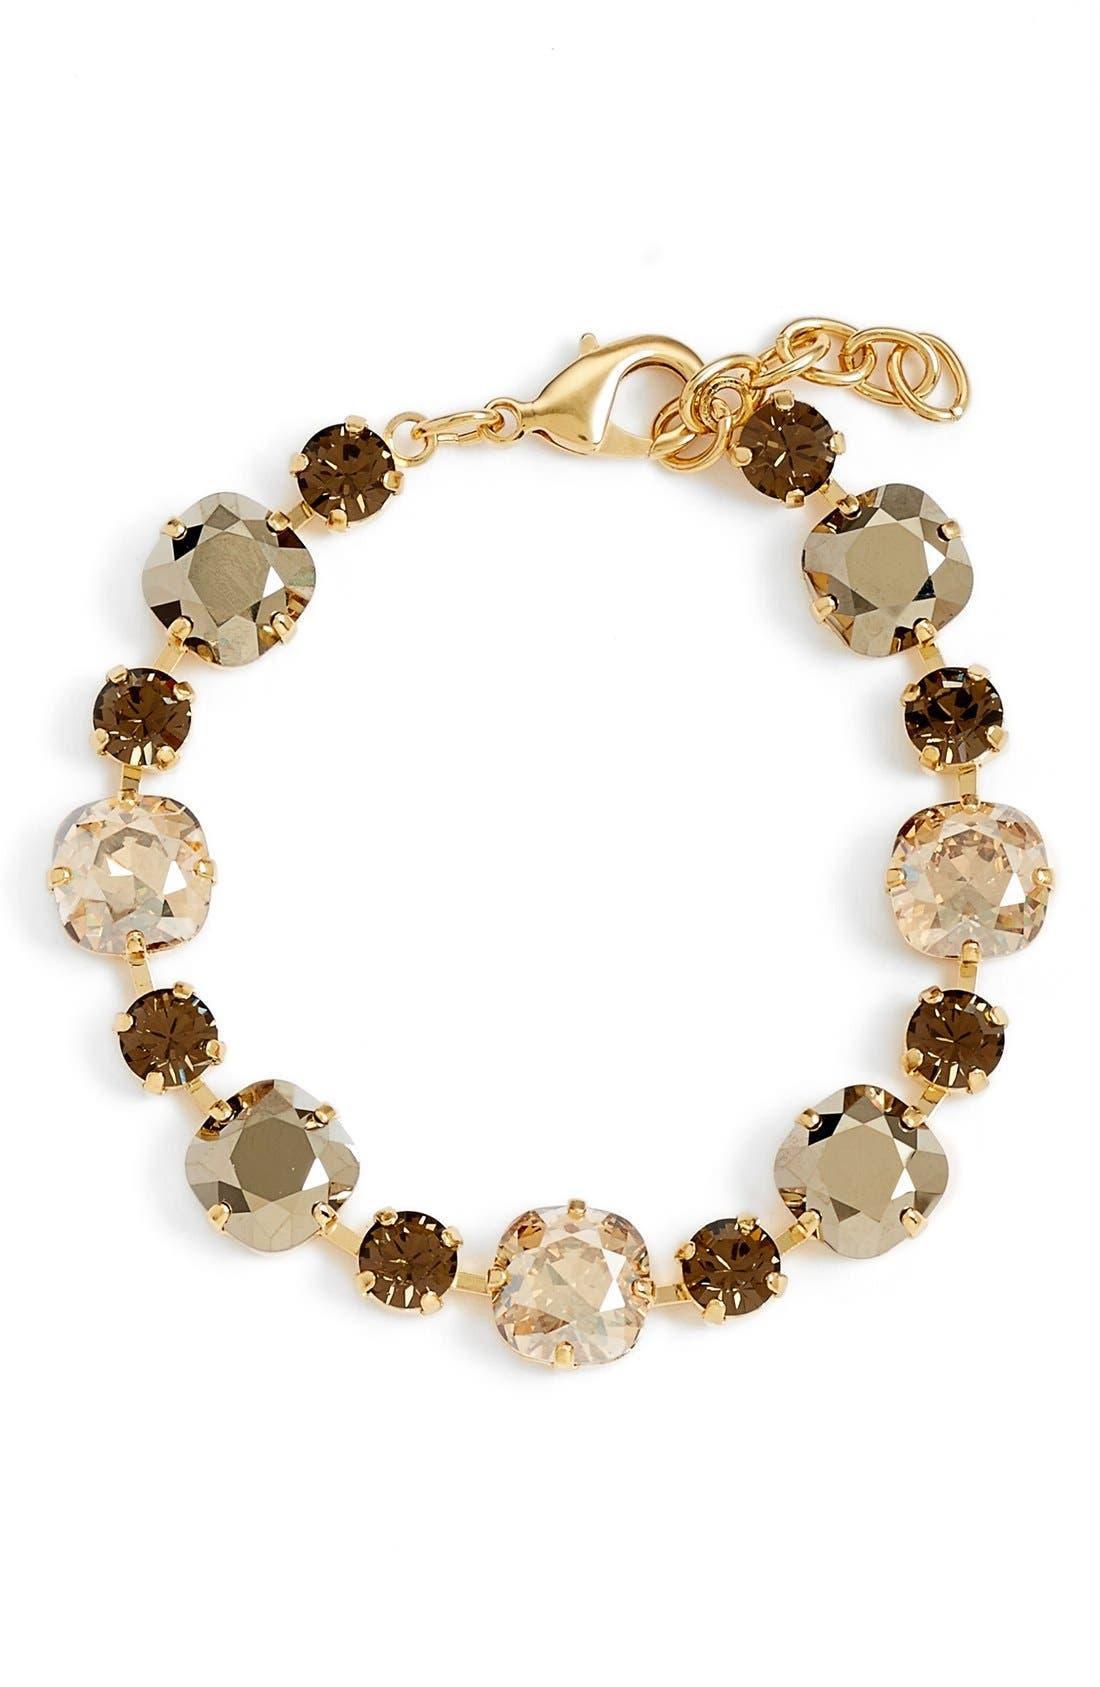 'Audrey' Multi Stone Bracelet,                             Main thumbnail 1, color,                             Cryrosegld/ Topaz/ Top/ Gold